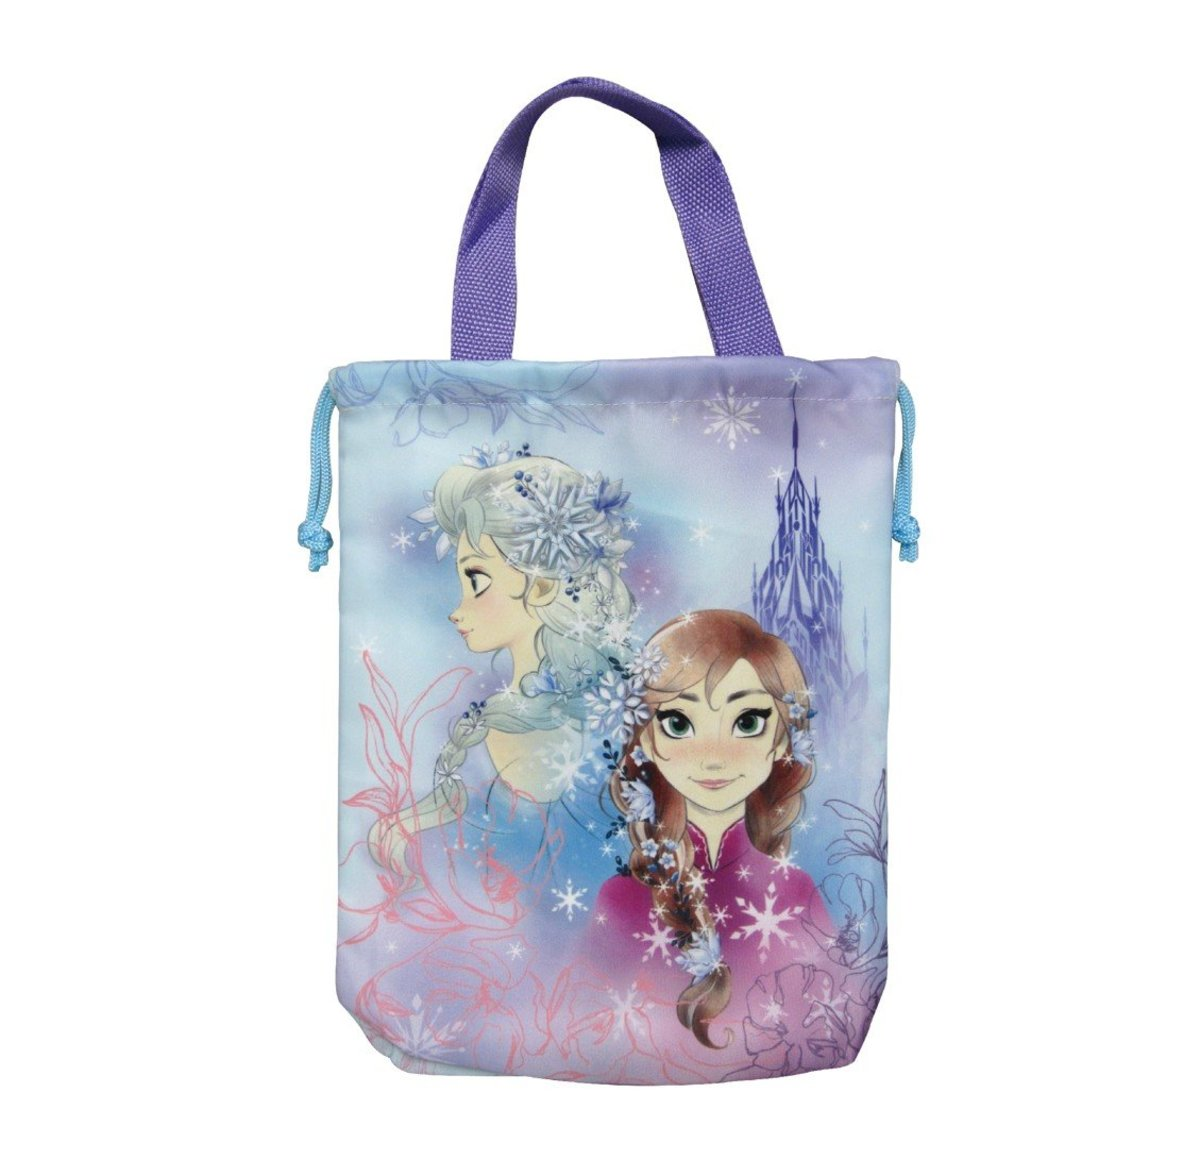 Disney迪士尼 --手挽袋 (迪士尼許可產品)